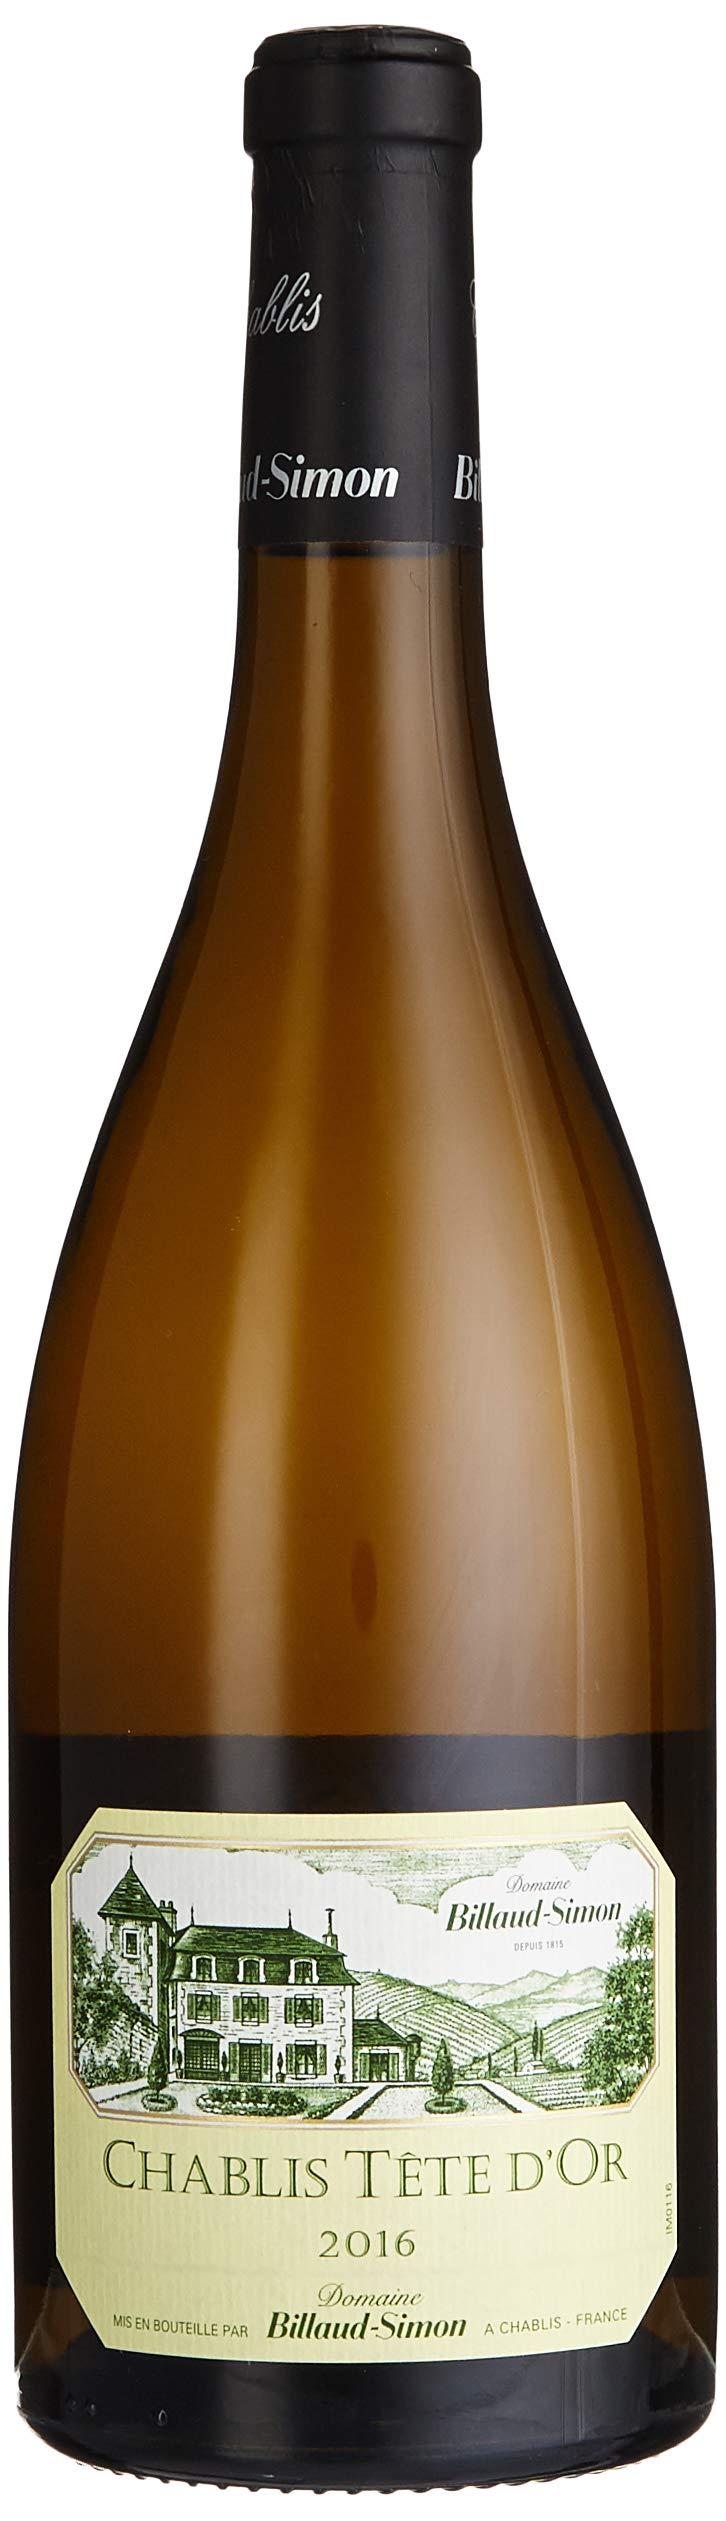 Domaine-Billaud-Simon-Chablis-Tte-dOr-AOC-Chardonnay-2015-trocken-1-x-075-l